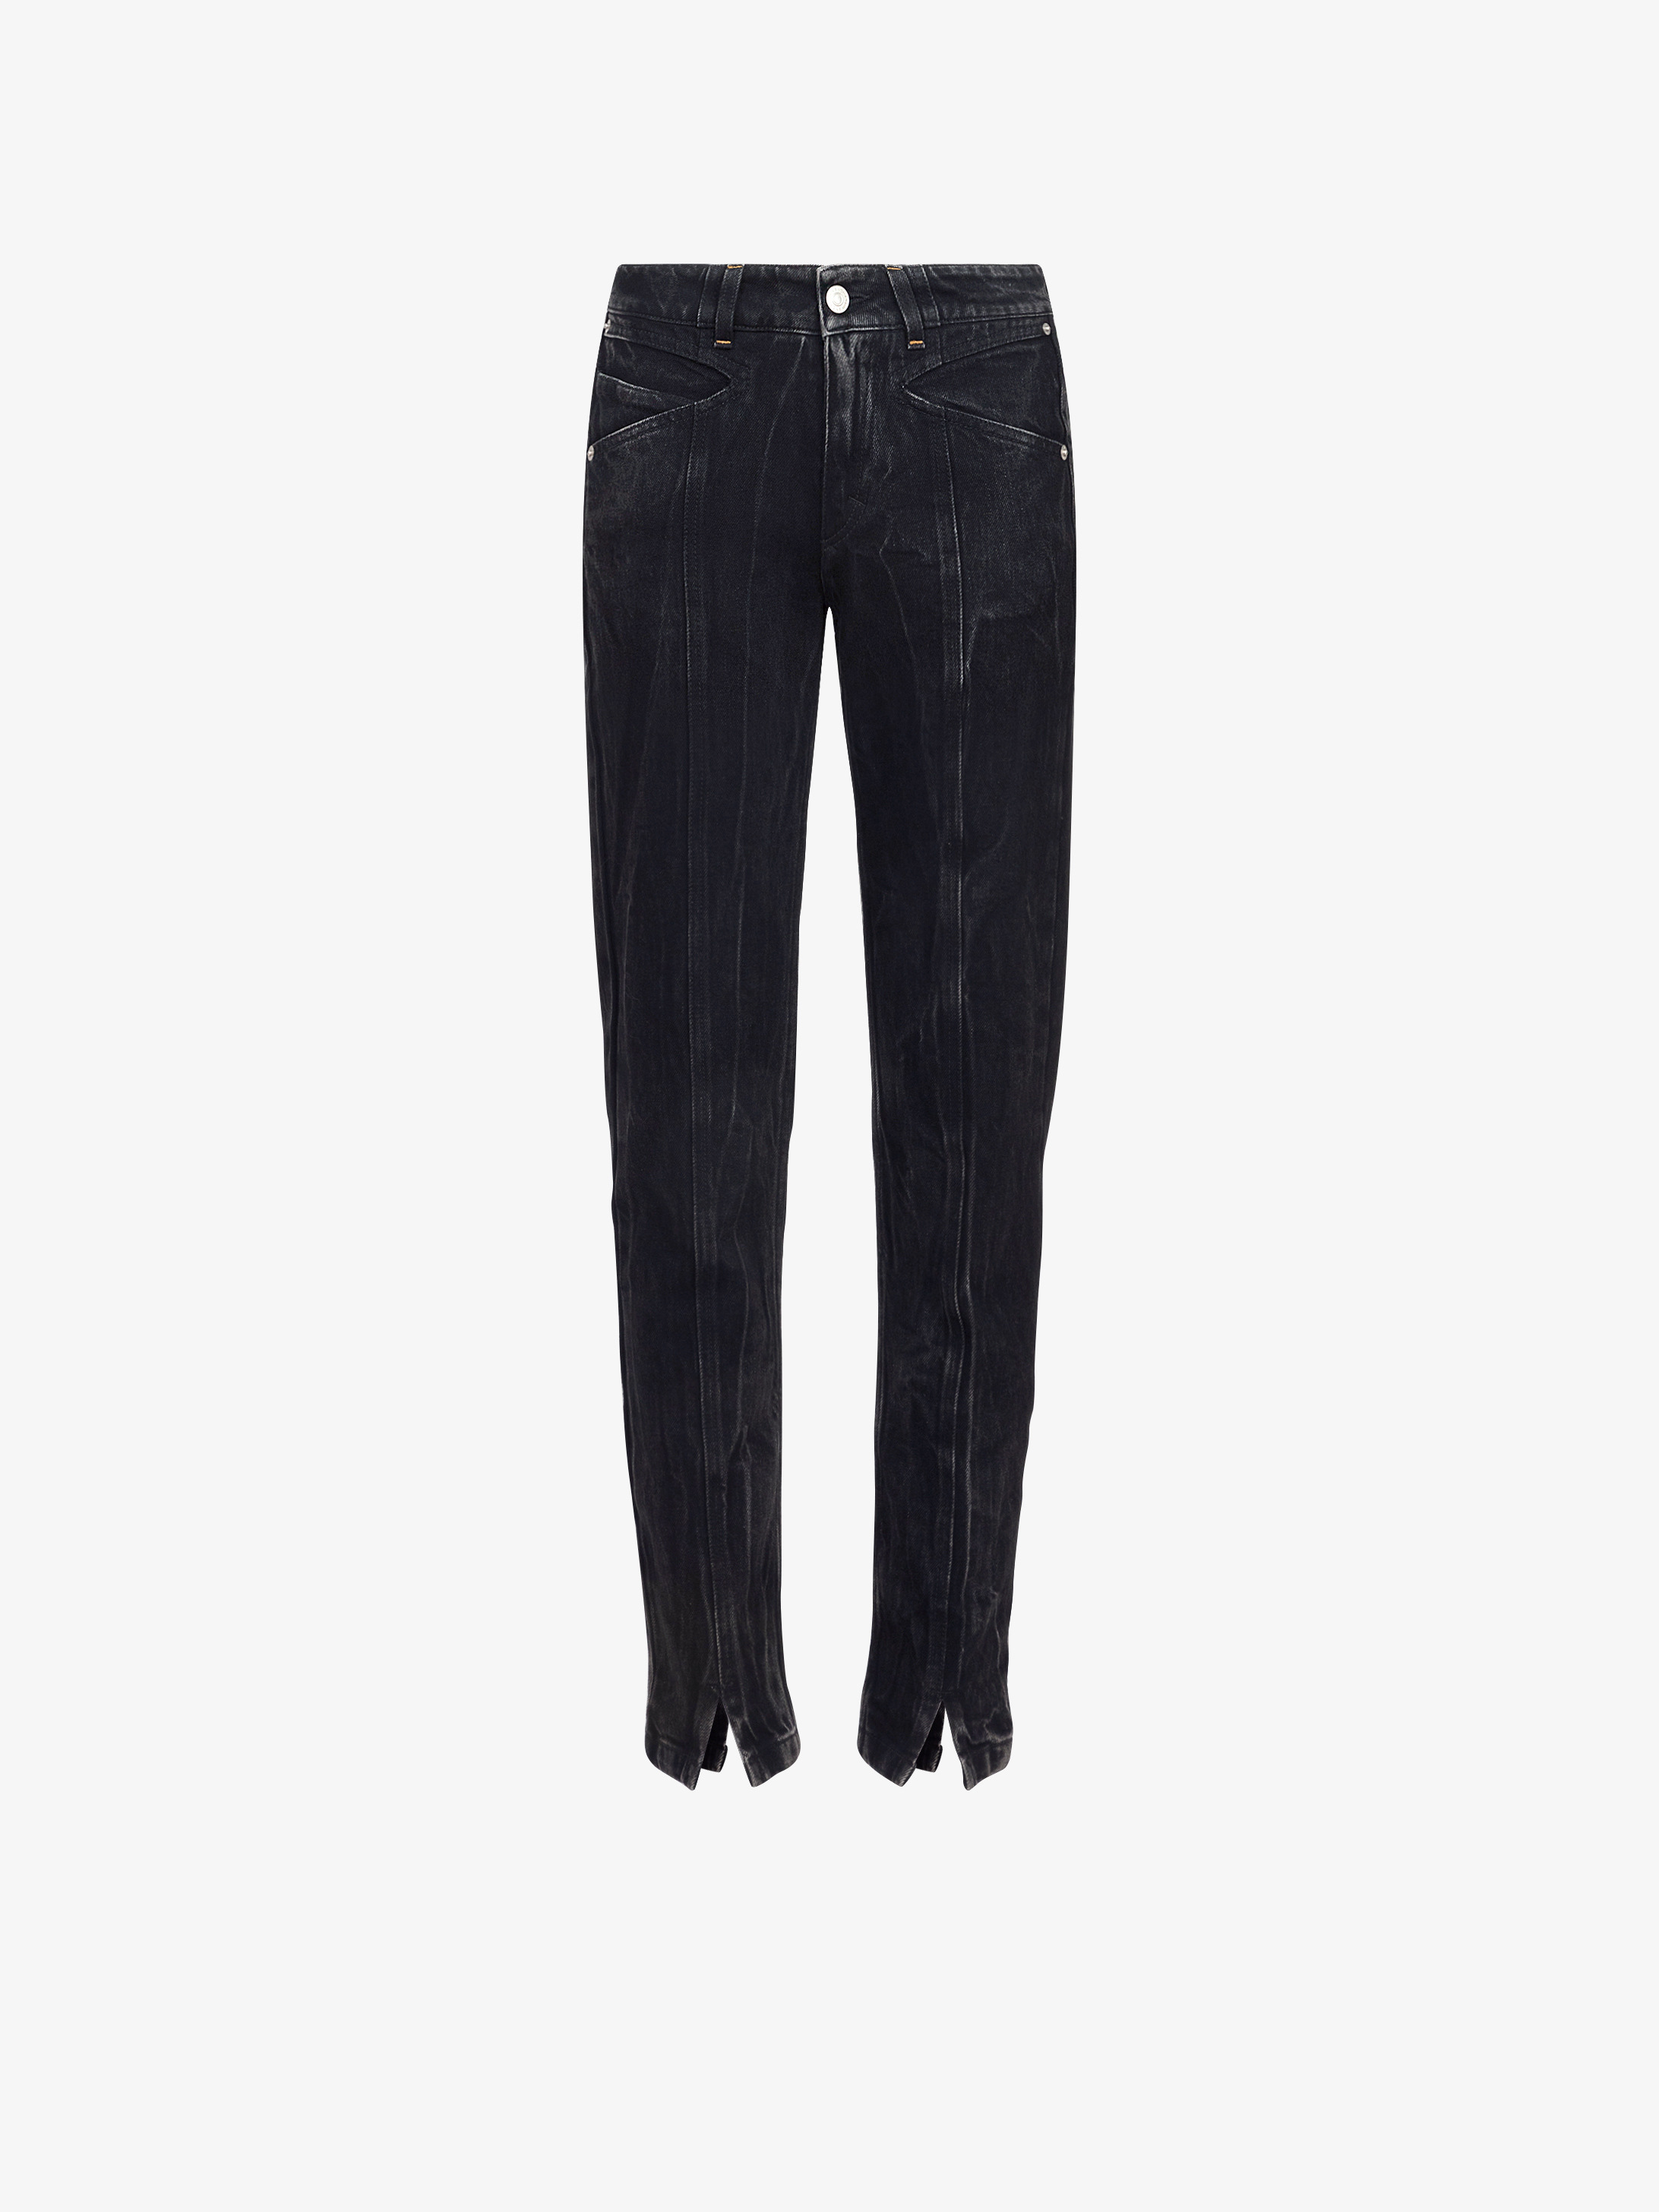 Marble denim slim fit jeans